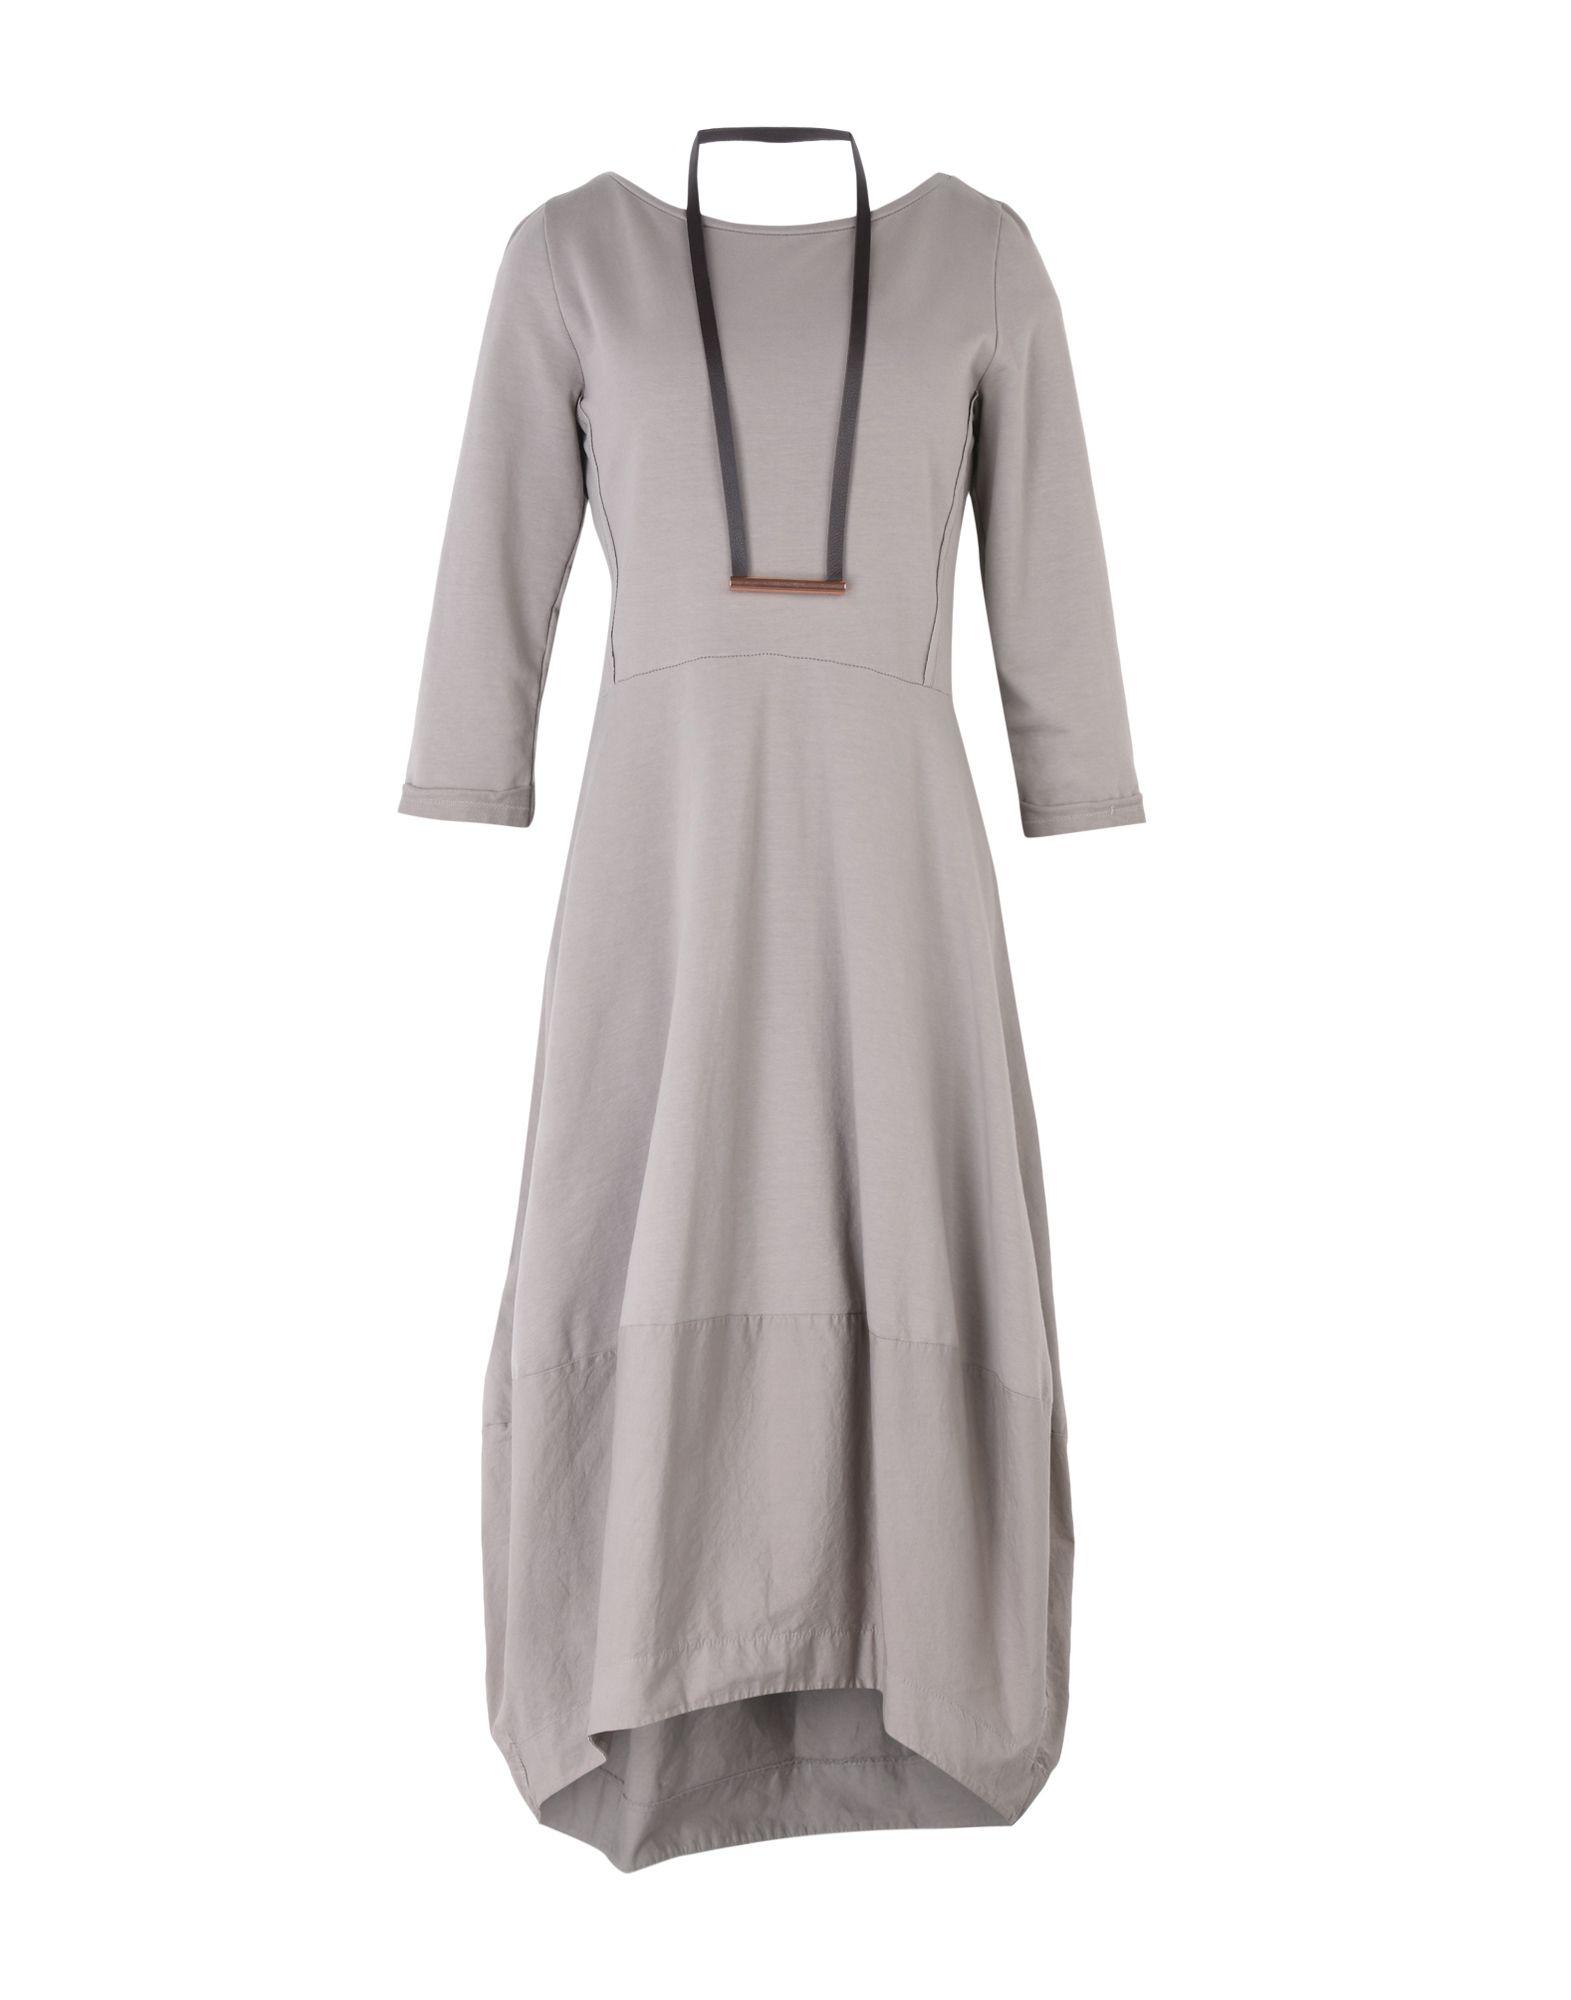 MOTEL Платье длиной 3/4 neeru kumar платье длиной 3 4